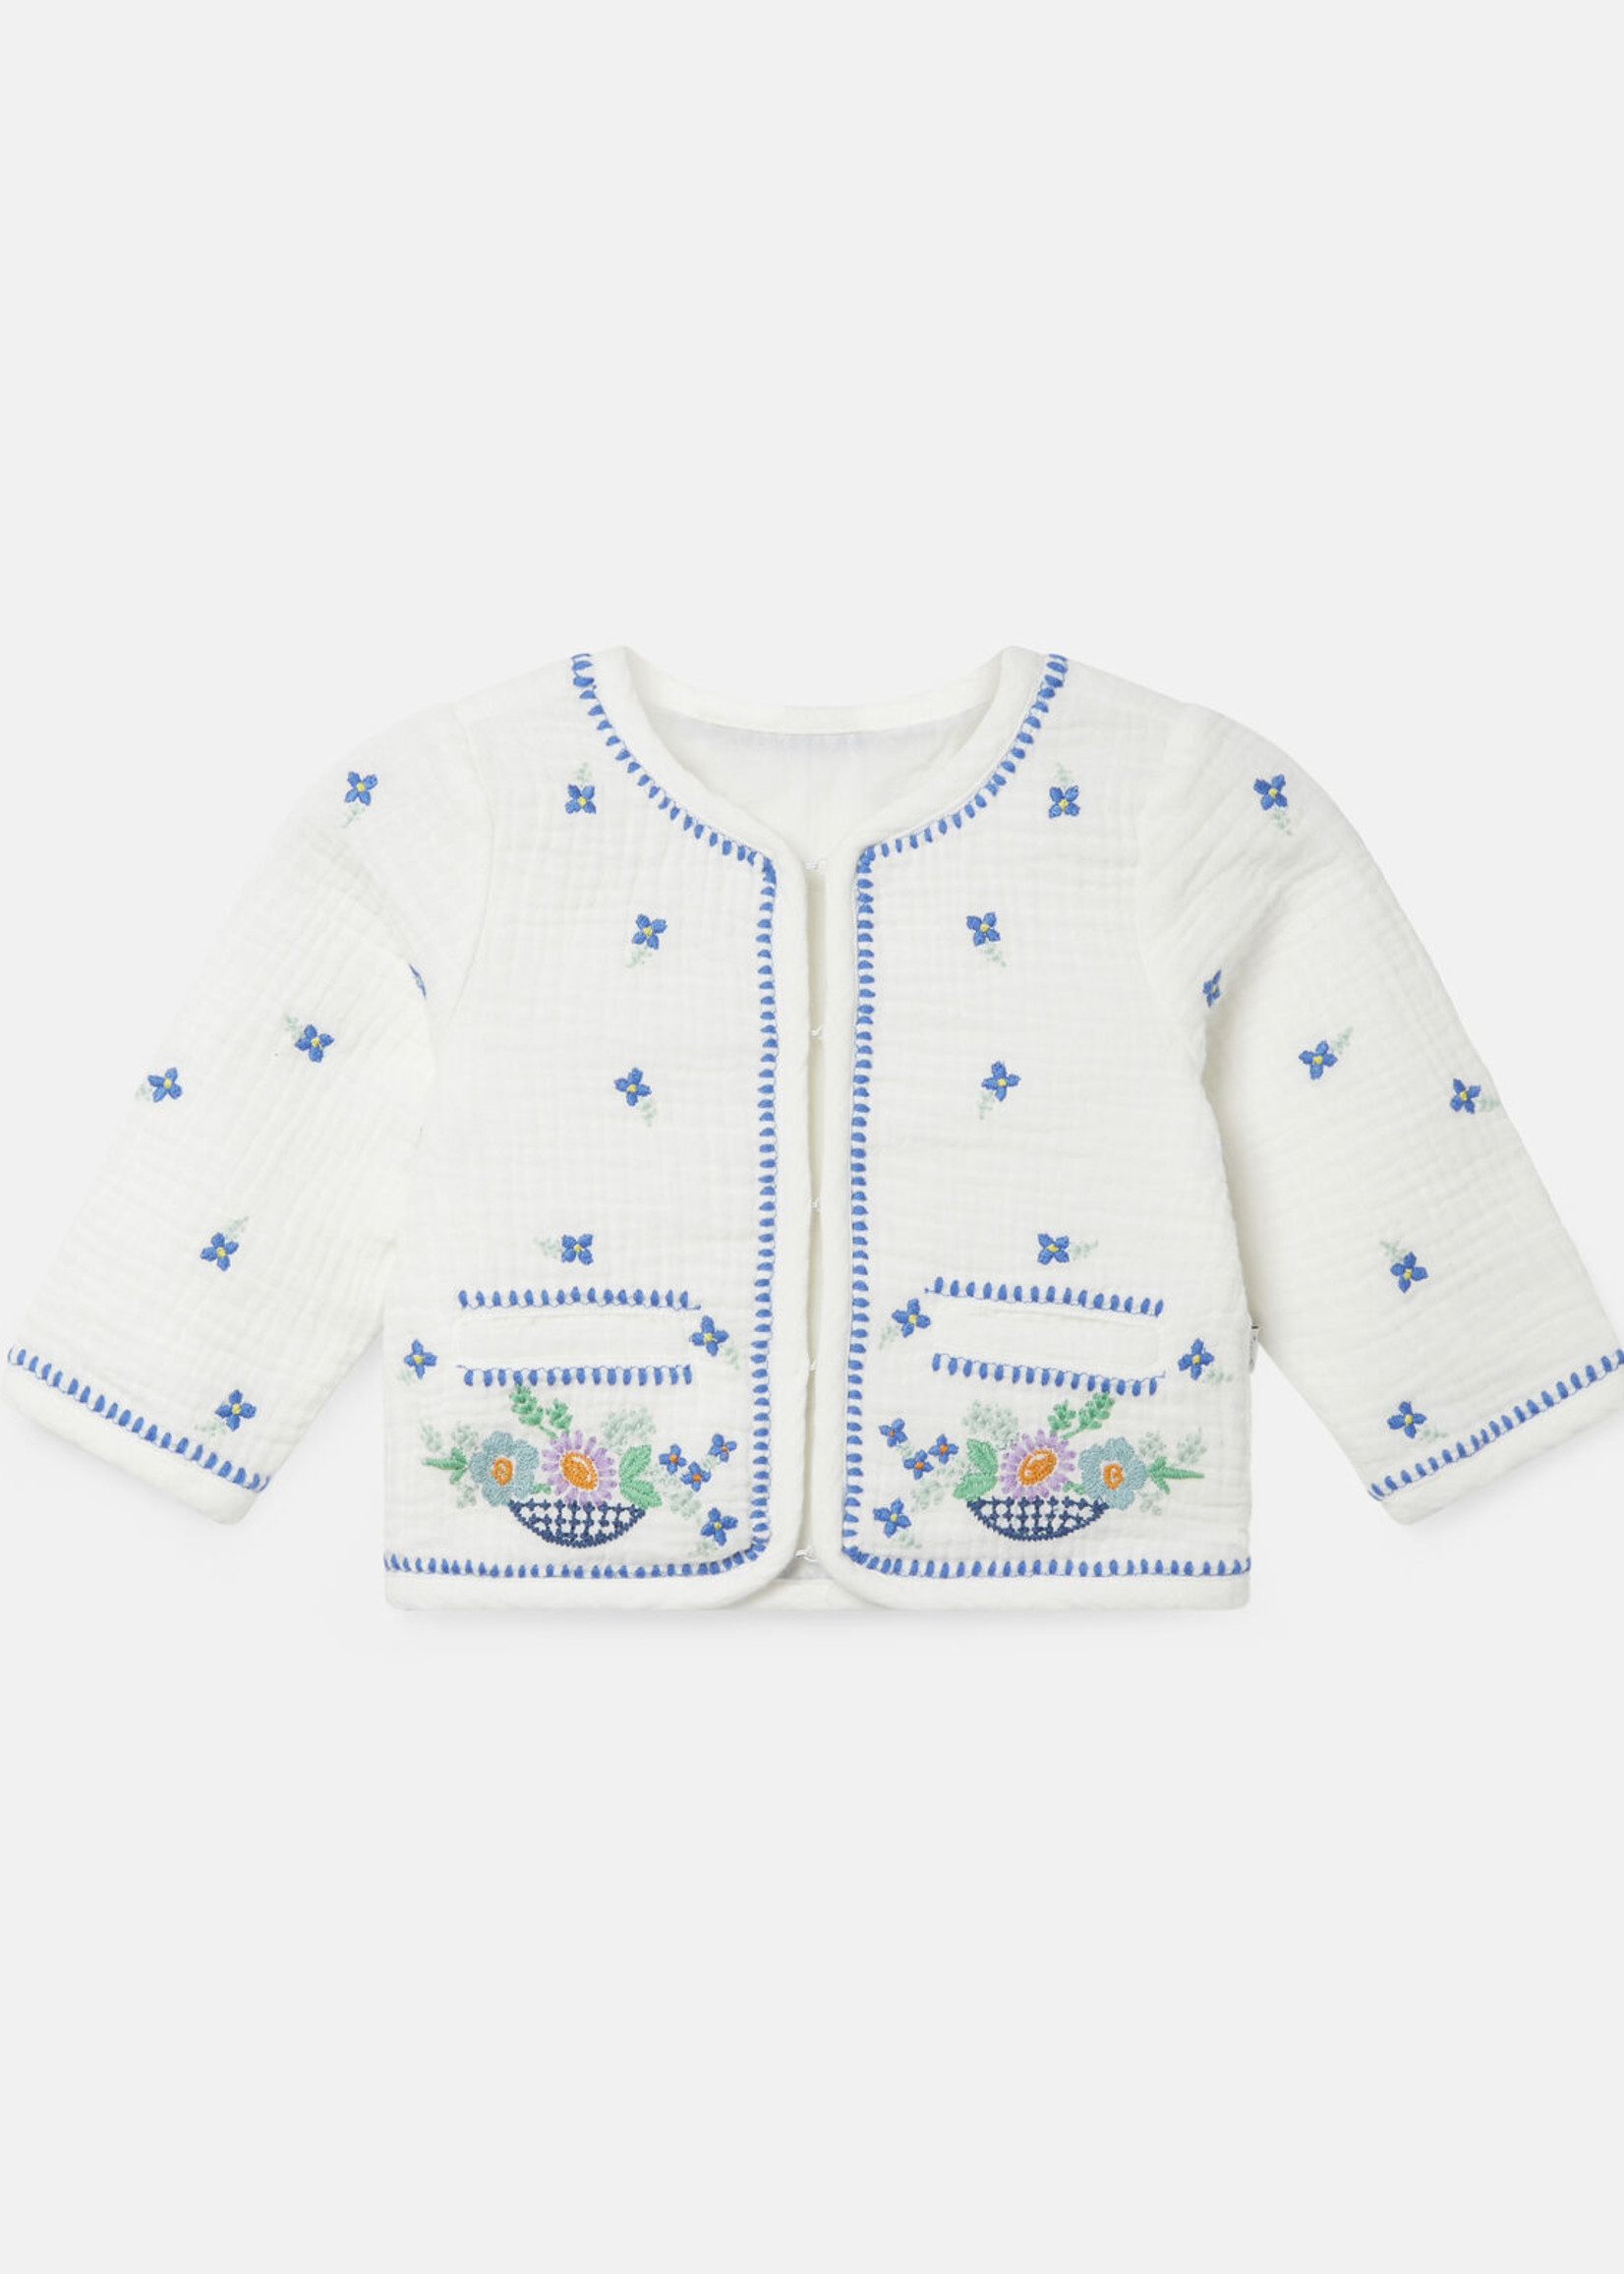 Stella McCartney Stella Mccartney Embroidered Flowers Cotton Jacket 602557 SQKD3